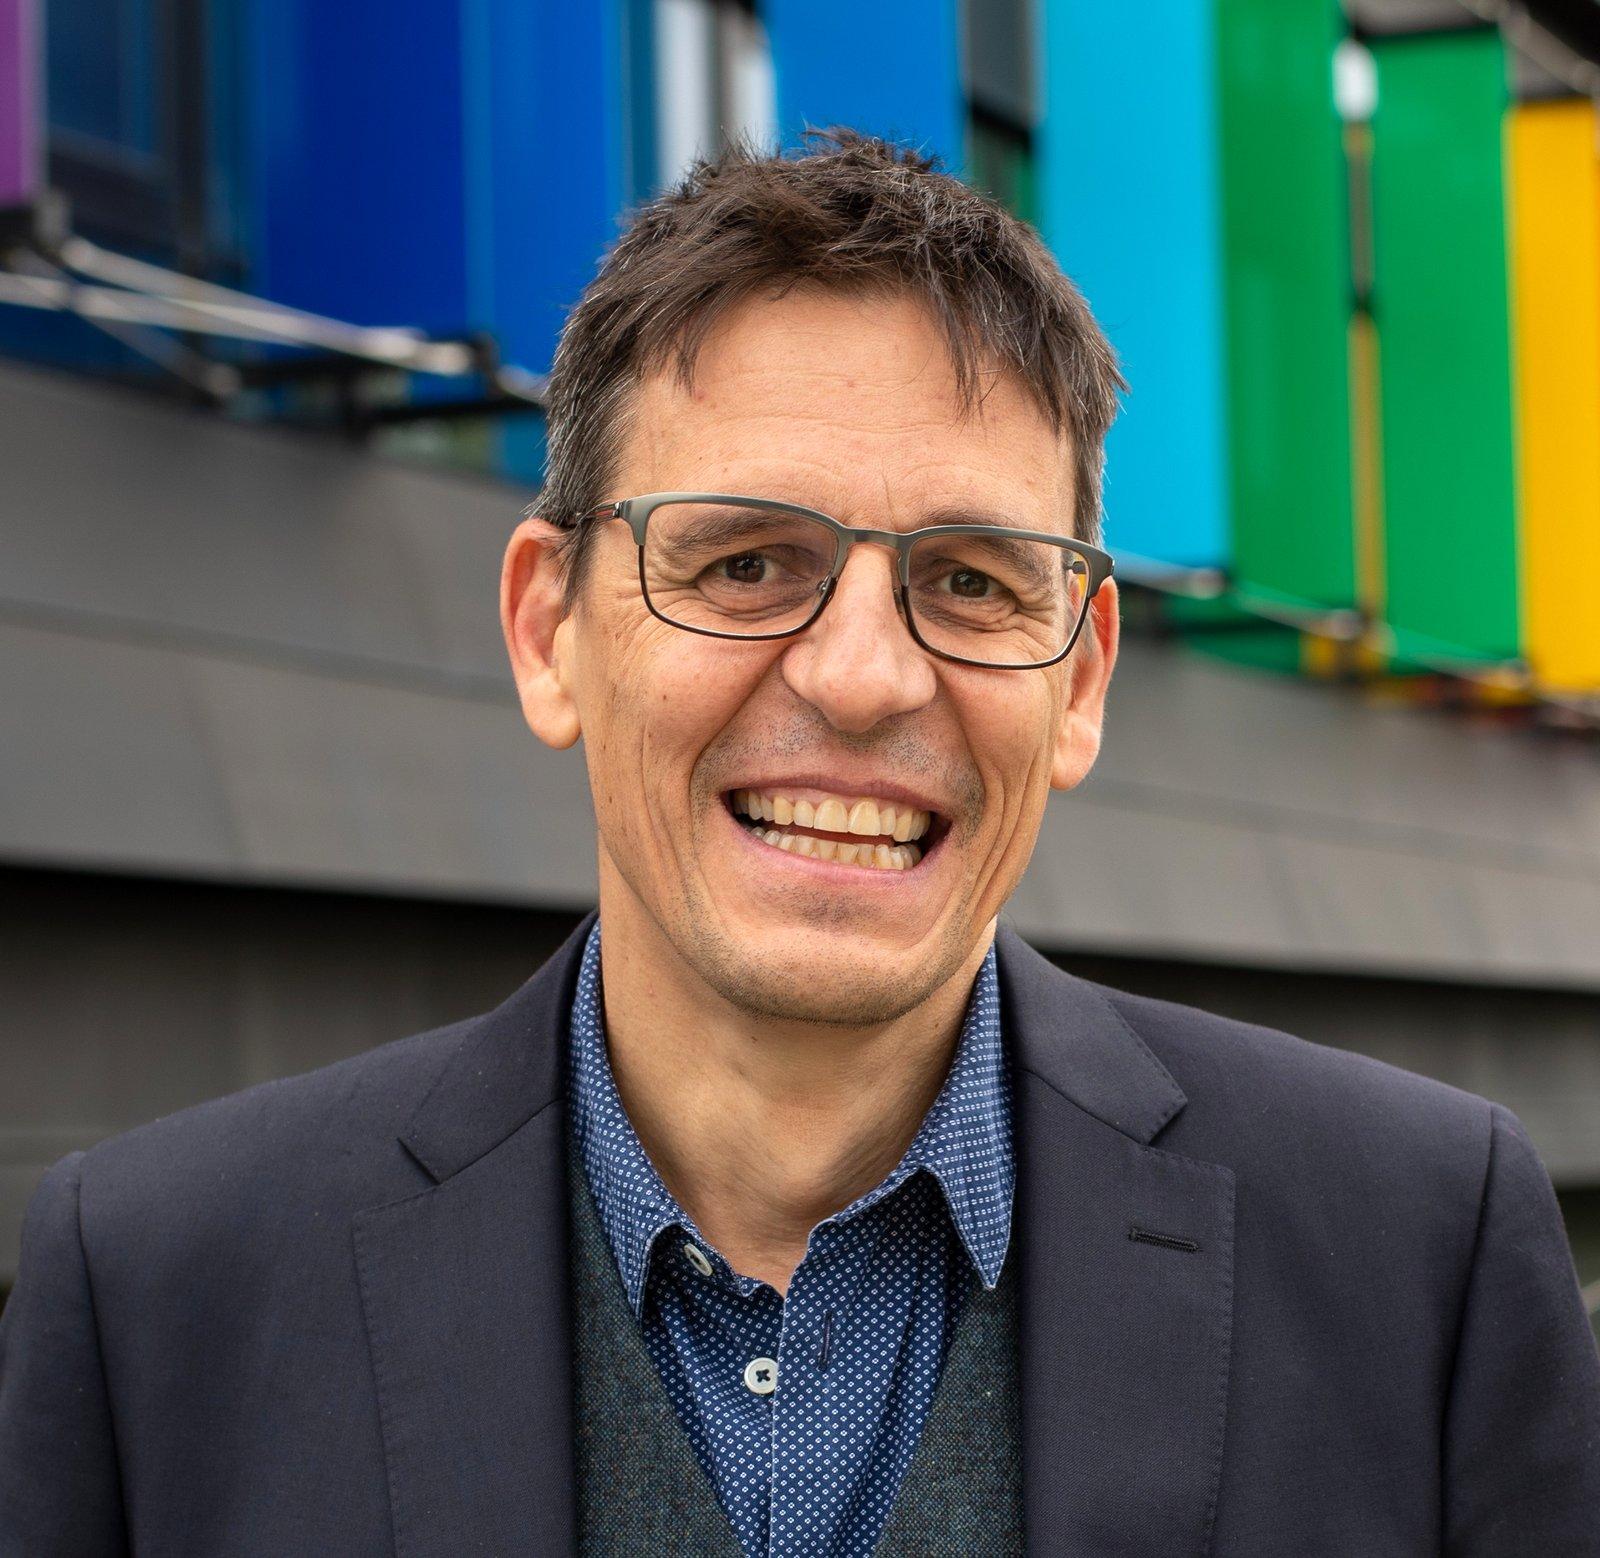 Prof. Didier Queloz